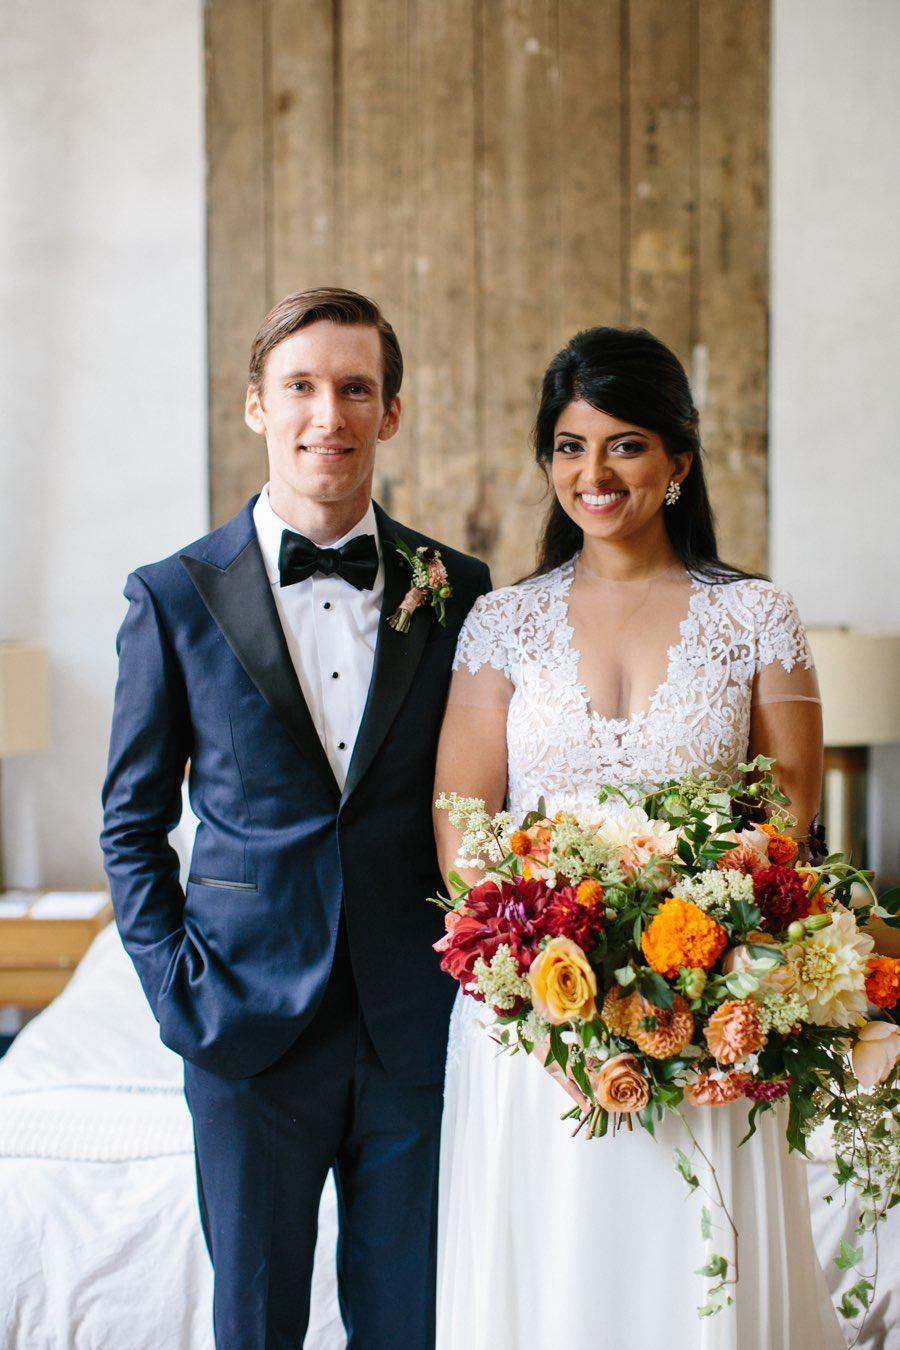 simran-dhillon-kevin-godshalk-wedding